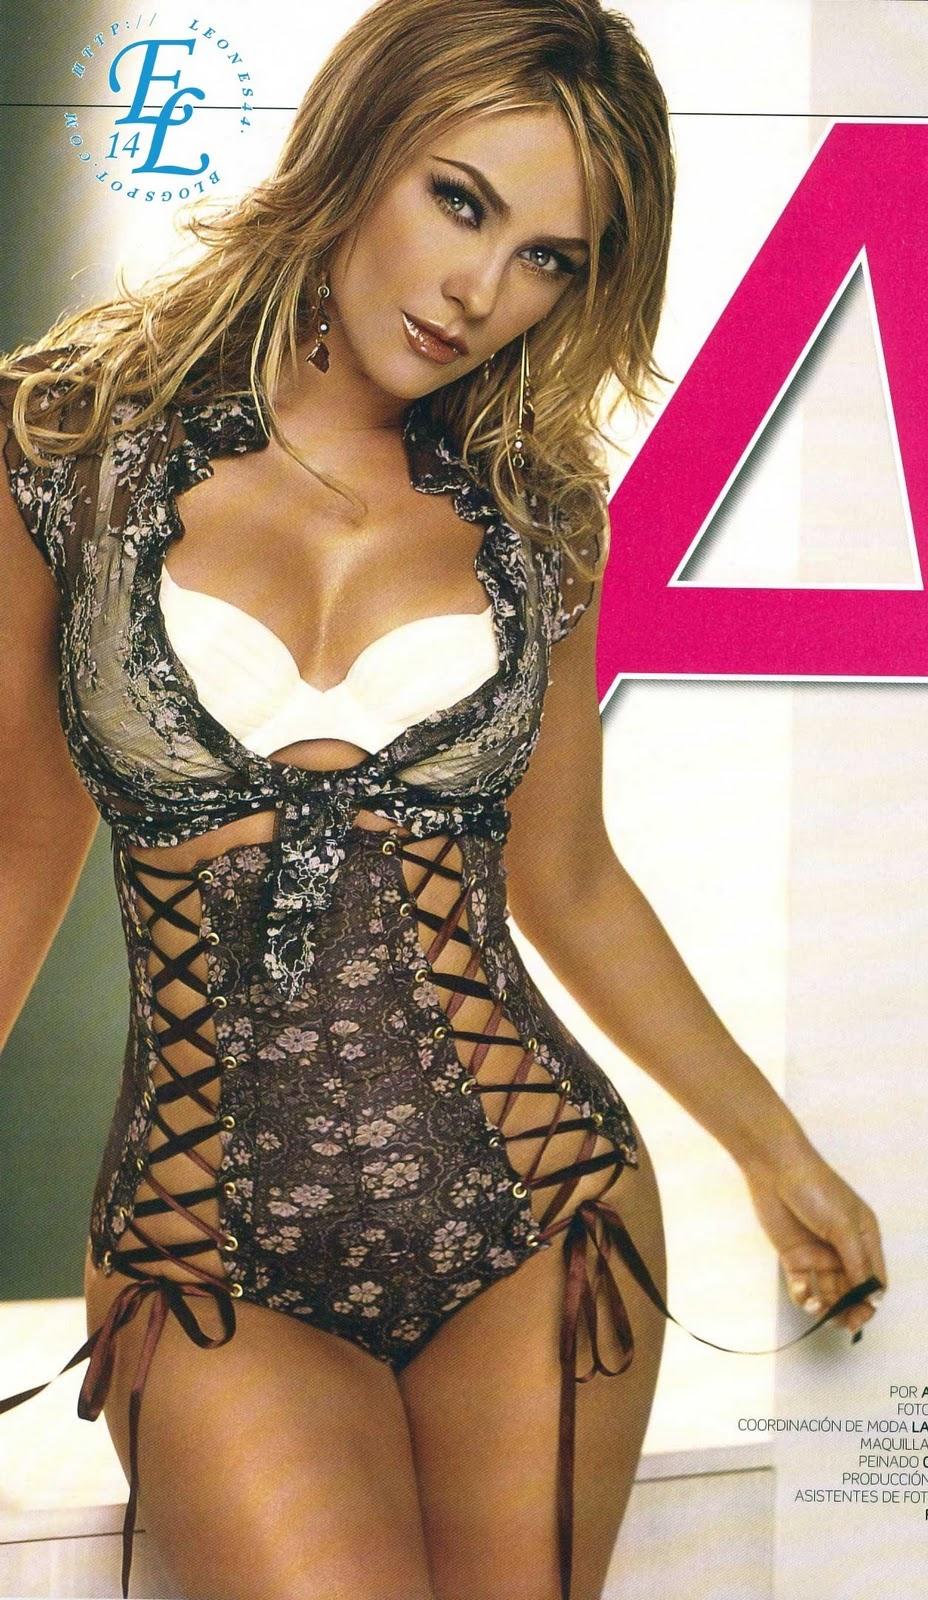 Angelique Boyer En H Extremo 2015 | New Calendar Template Site